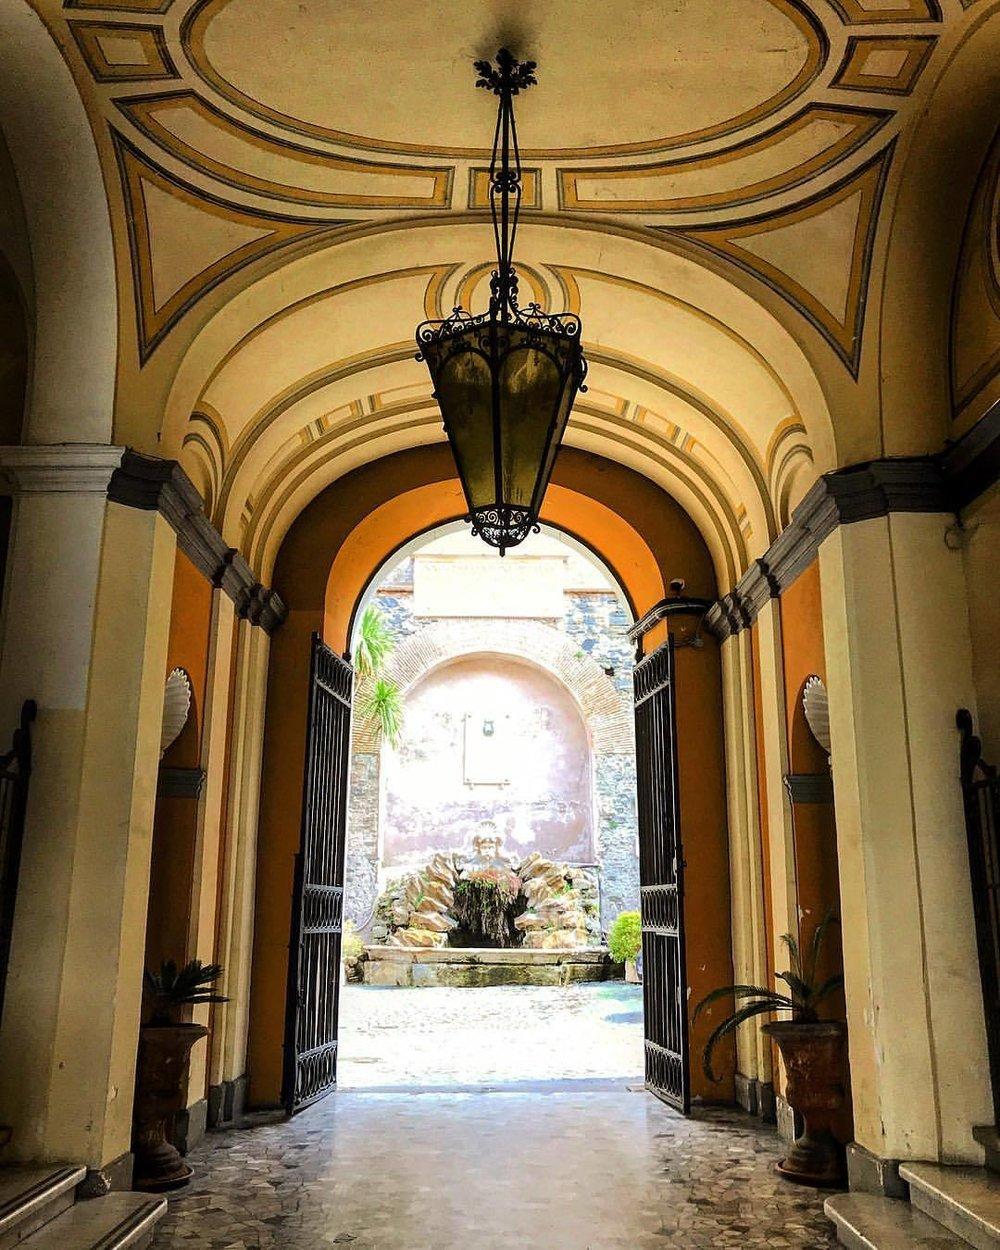 Foyer.  -  #italy #frascati #tuscany #architecture #doorway (at Frascati, Italy)